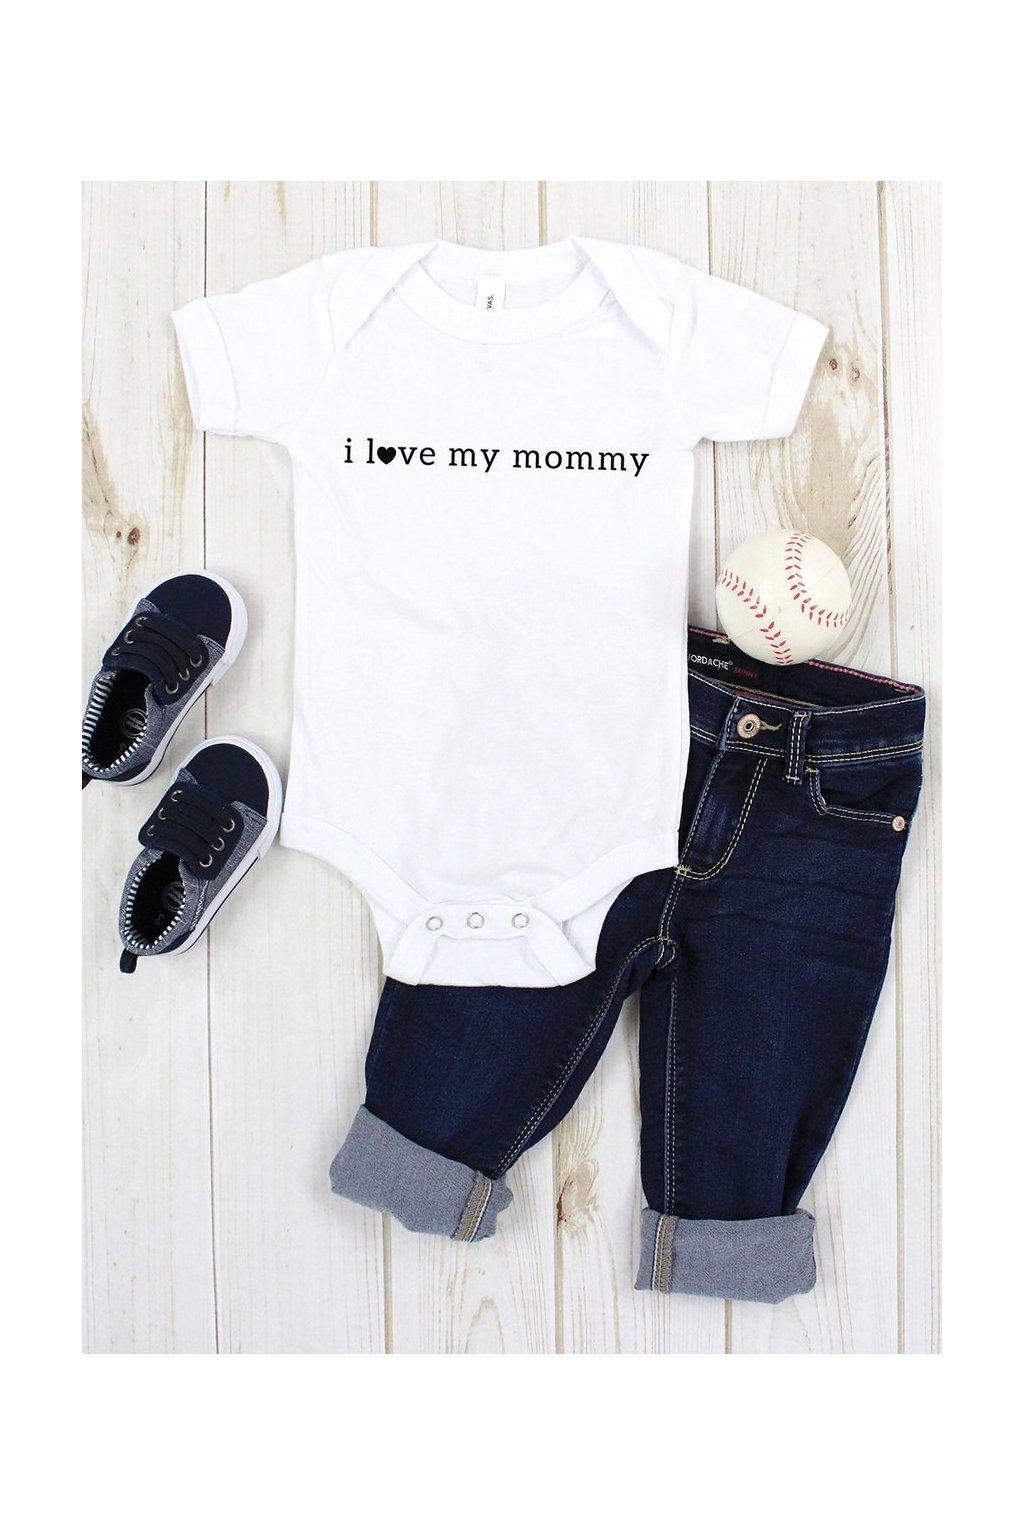 "I LOVE MILK - Body ""I love my mummy"" (Barva světle modrá, Velikost 86/92)"